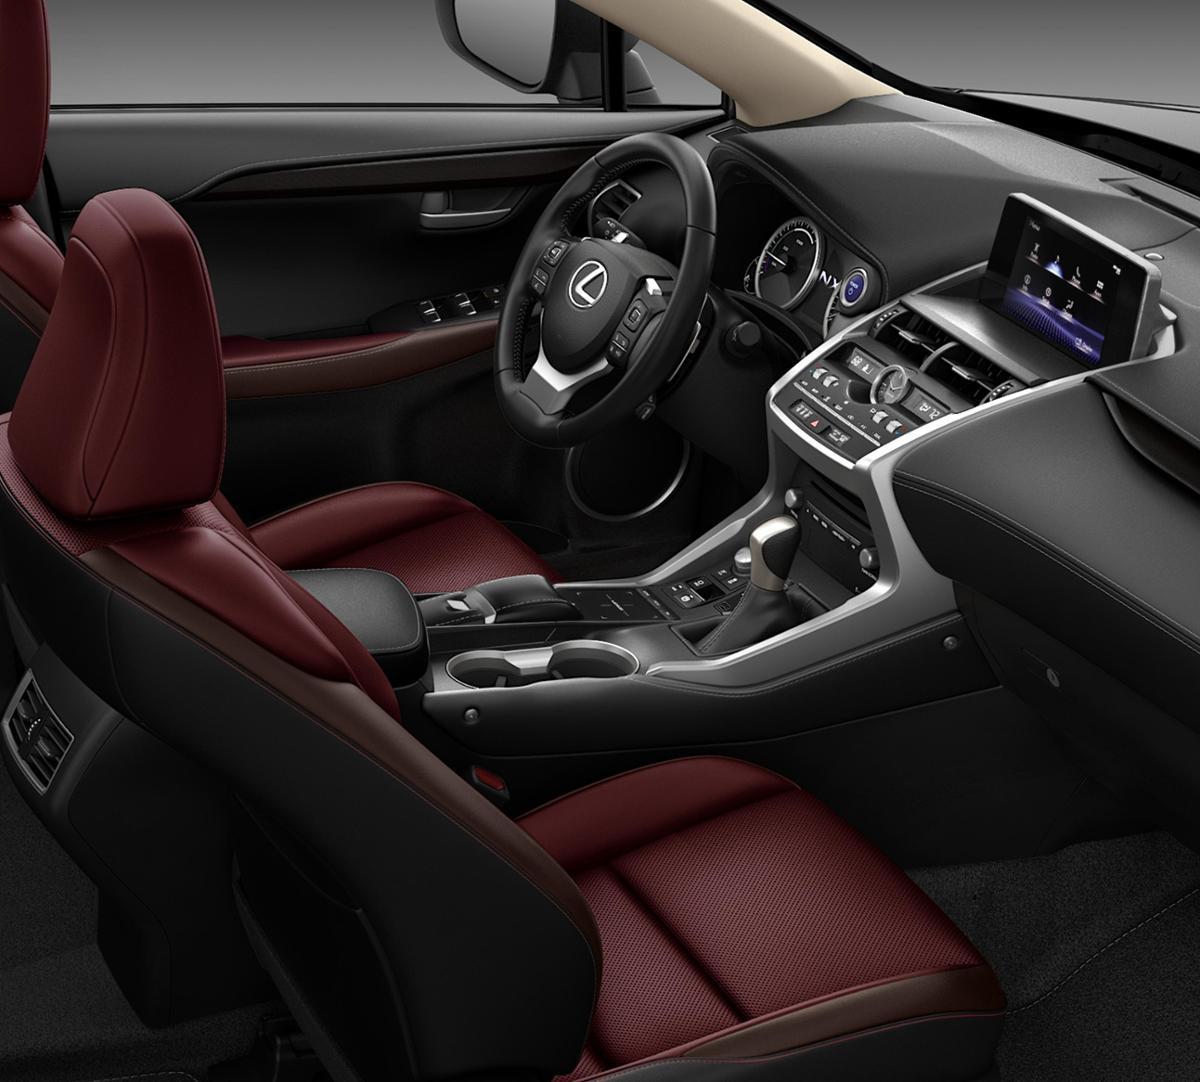 2019 Lexus NX 300h For Sale In Wayzata